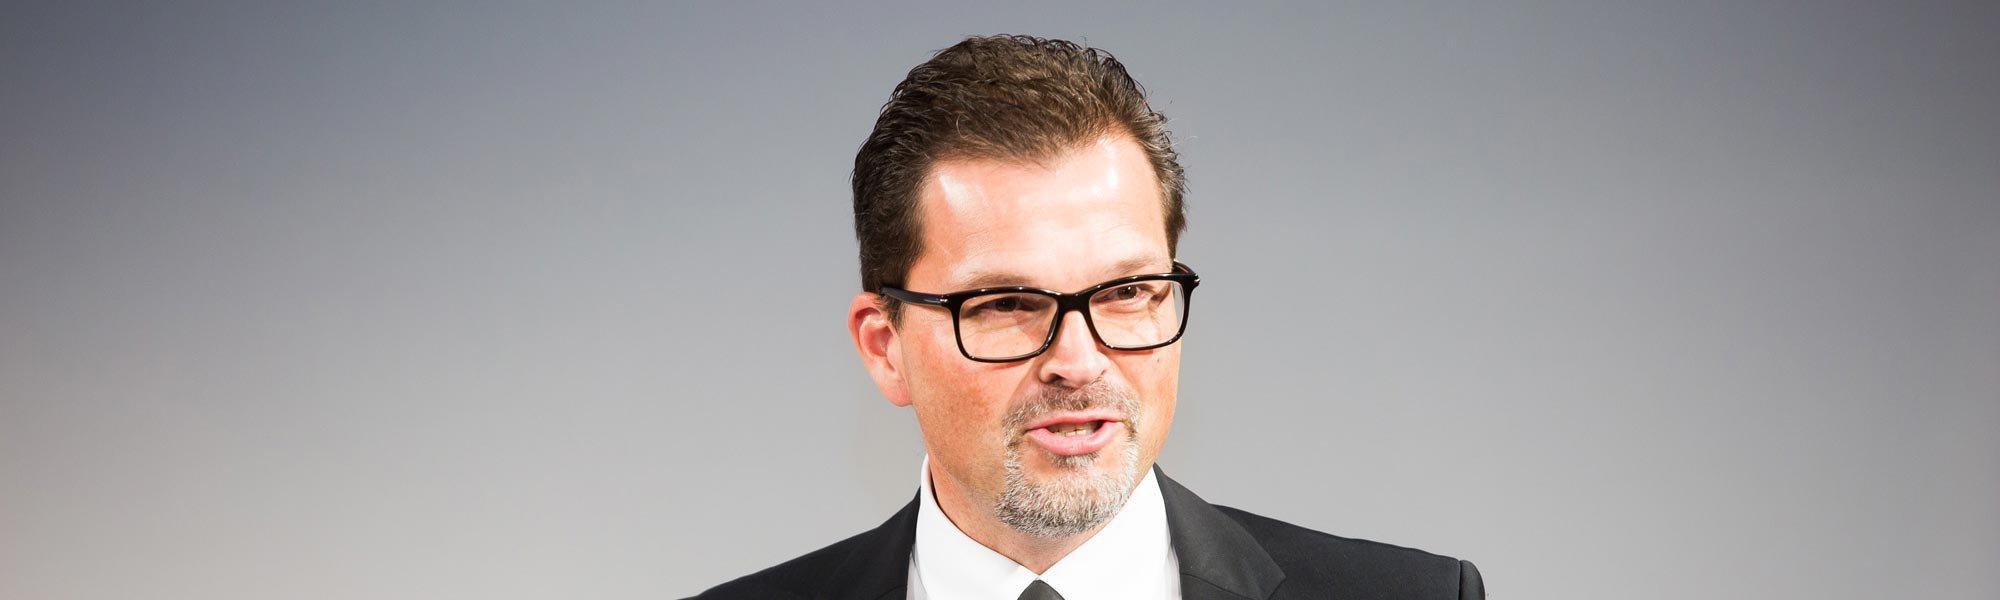 Frank Salzgeber